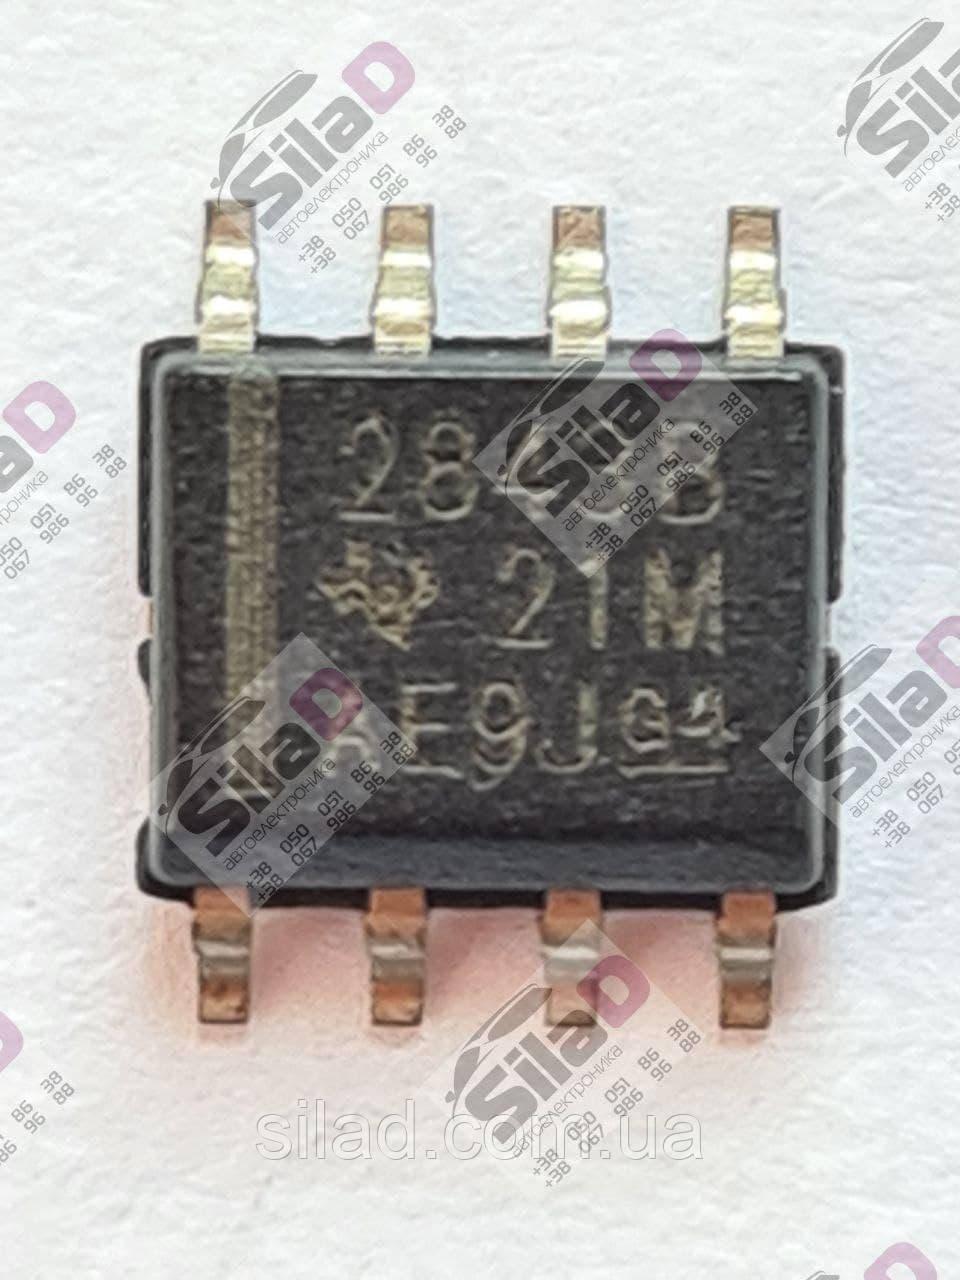 Микросхема TL2843 2843B Texas Instruments корпус SOIC-8